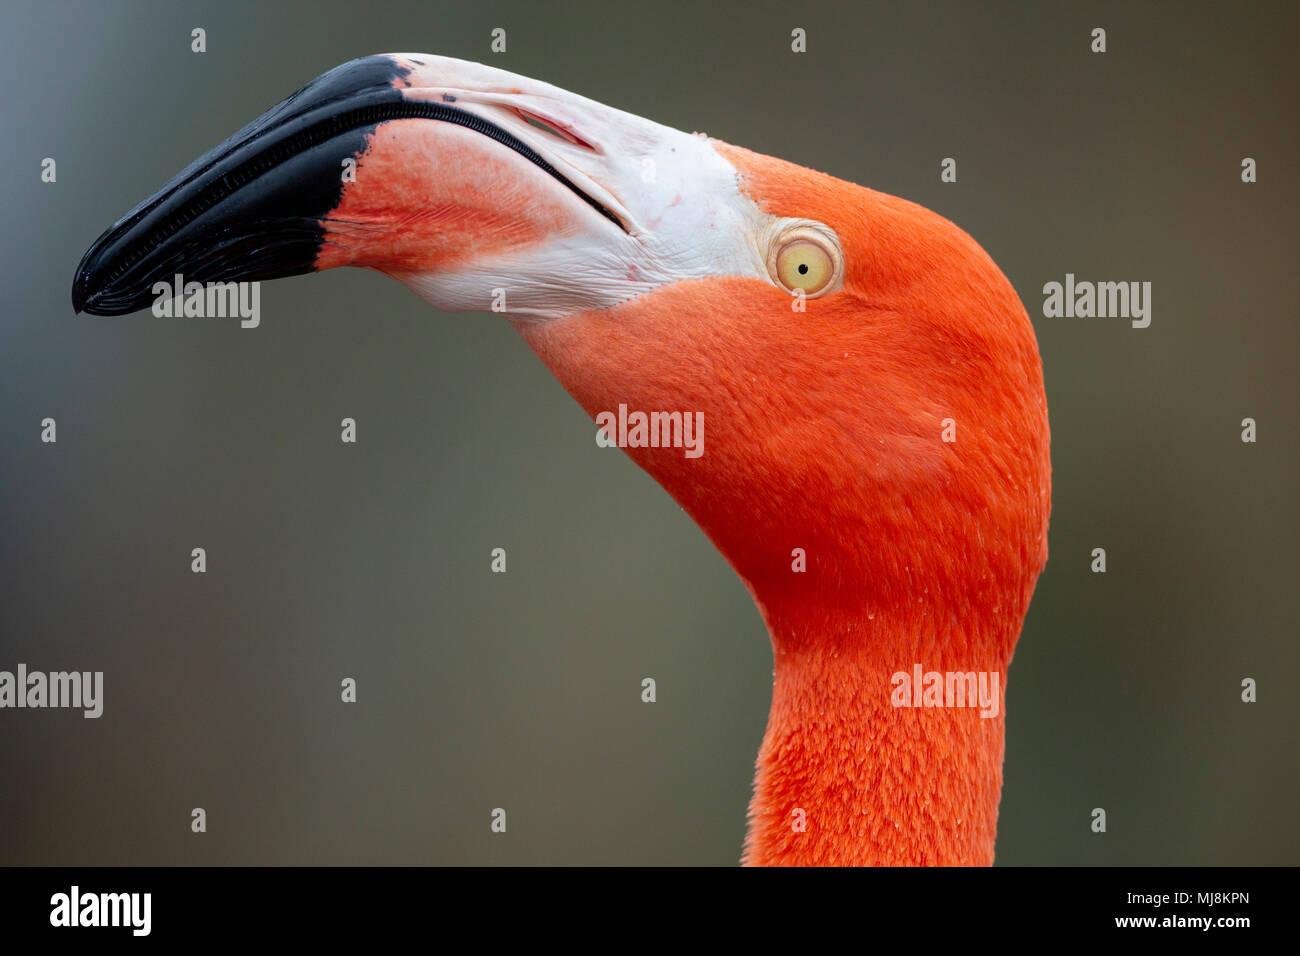 Red Caribbean flamingo close-up head detail - Stock Image